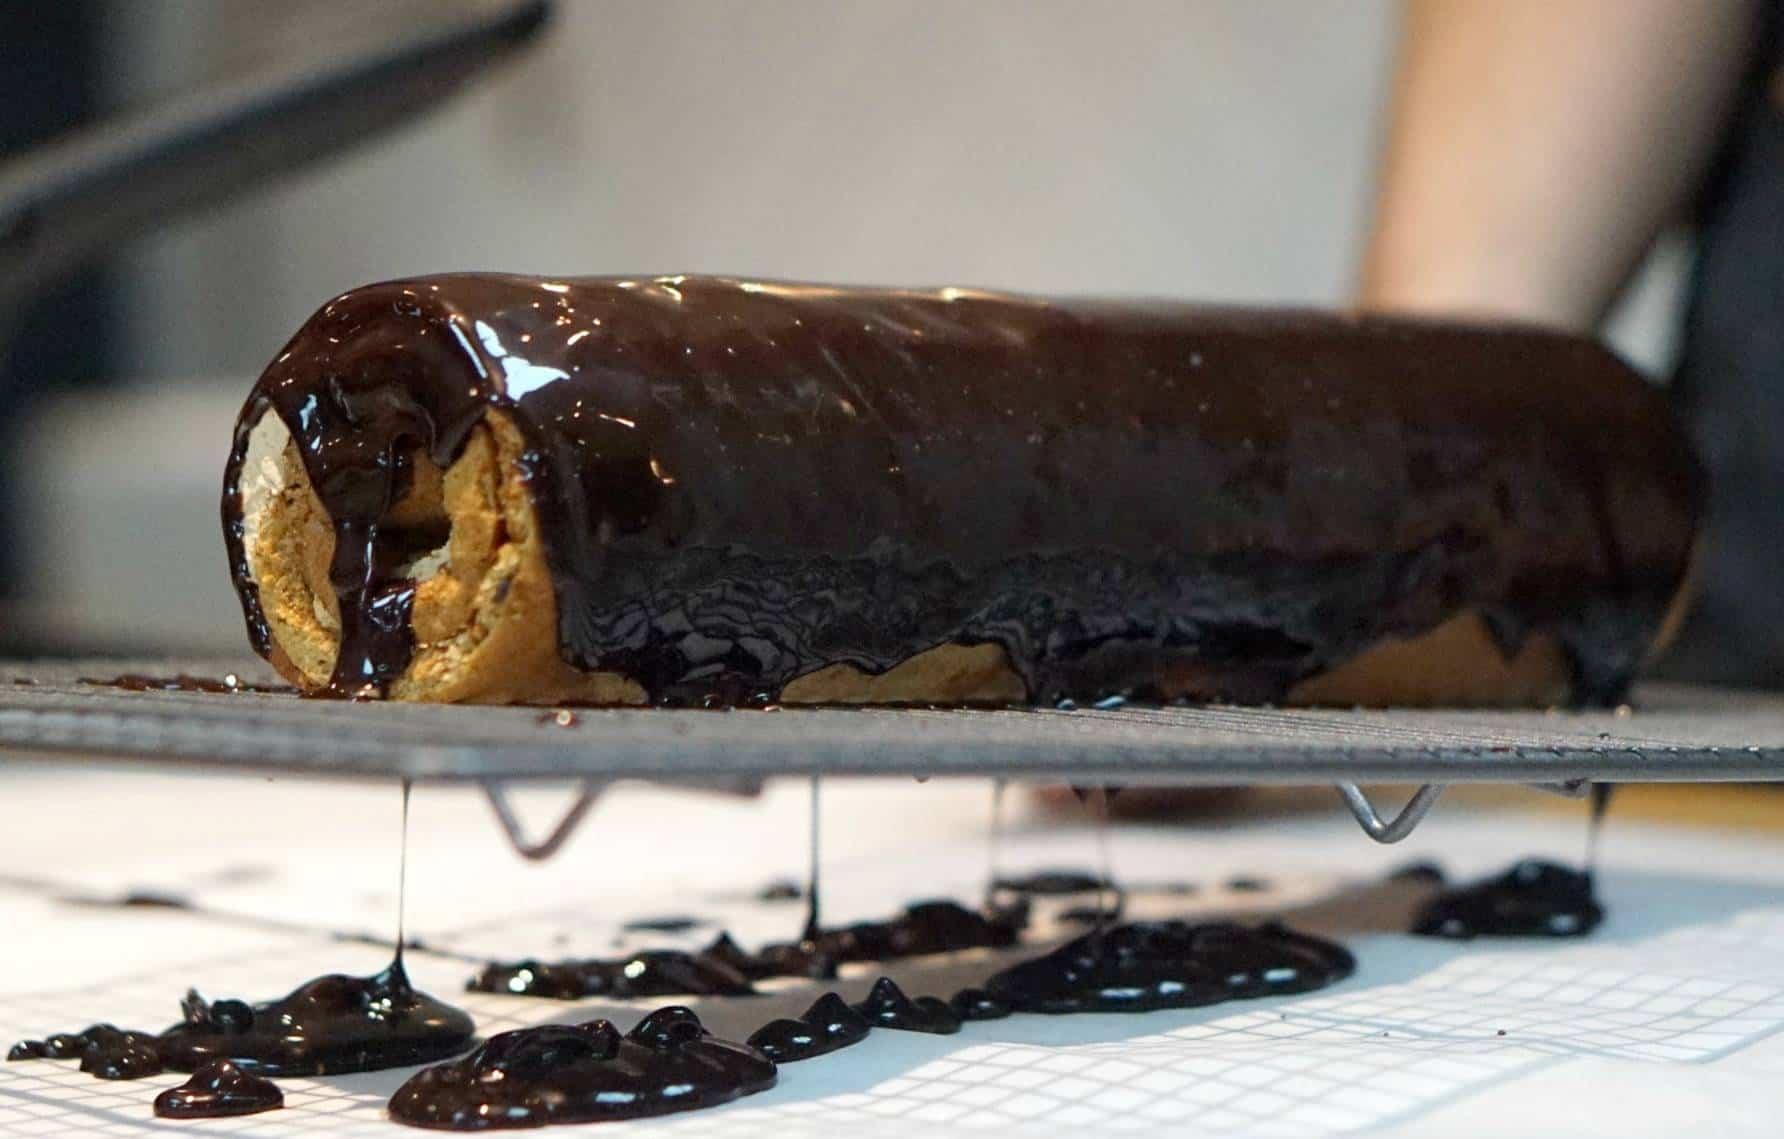 Making A Gingerbread Latte Swiss Roll in John Whaite's Kitchen